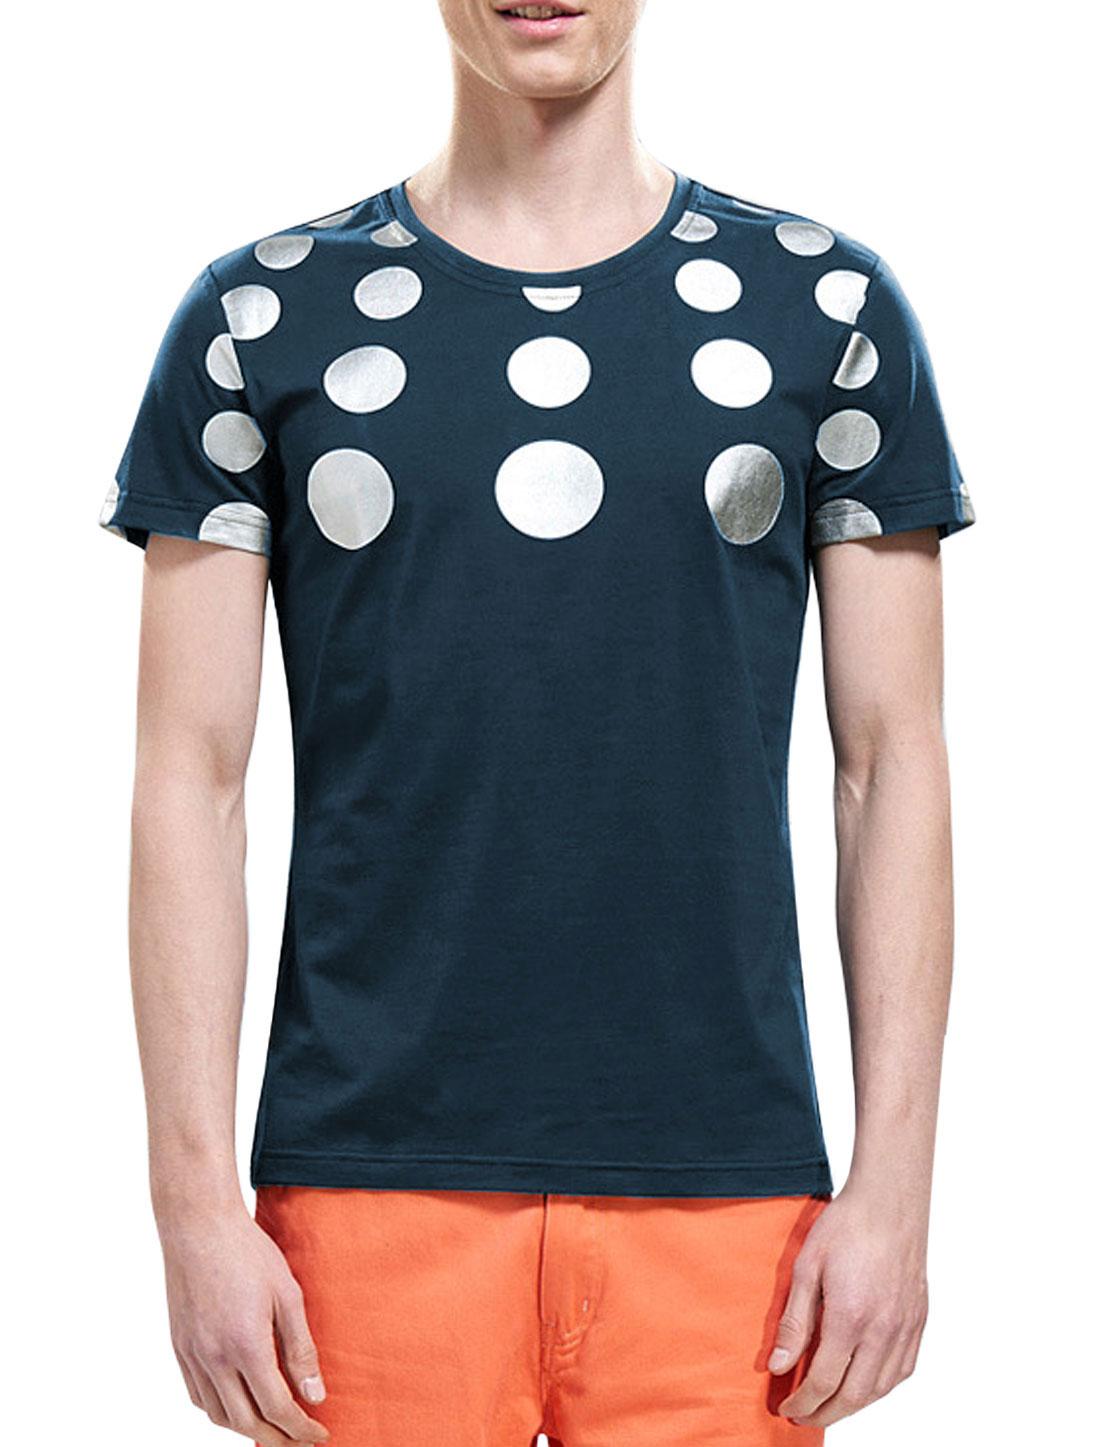 Men Round Neck Short Sleeves Polka Dots T-Shirts Navy Blue M